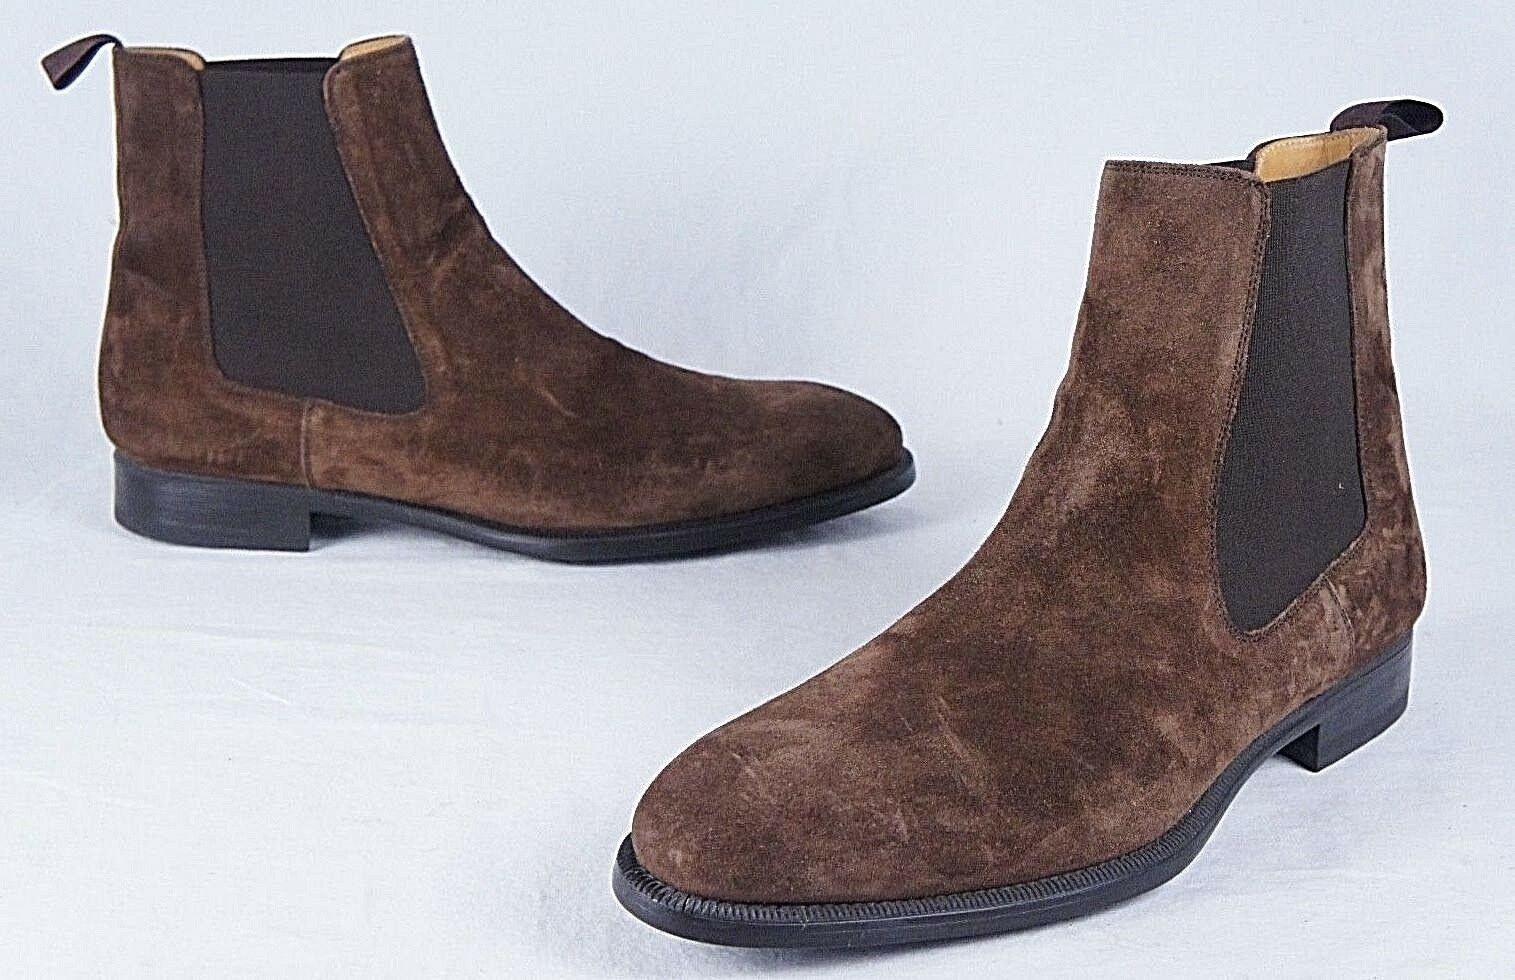 Magnanni Bareyo Chelsea bota (10M) Para Hombre